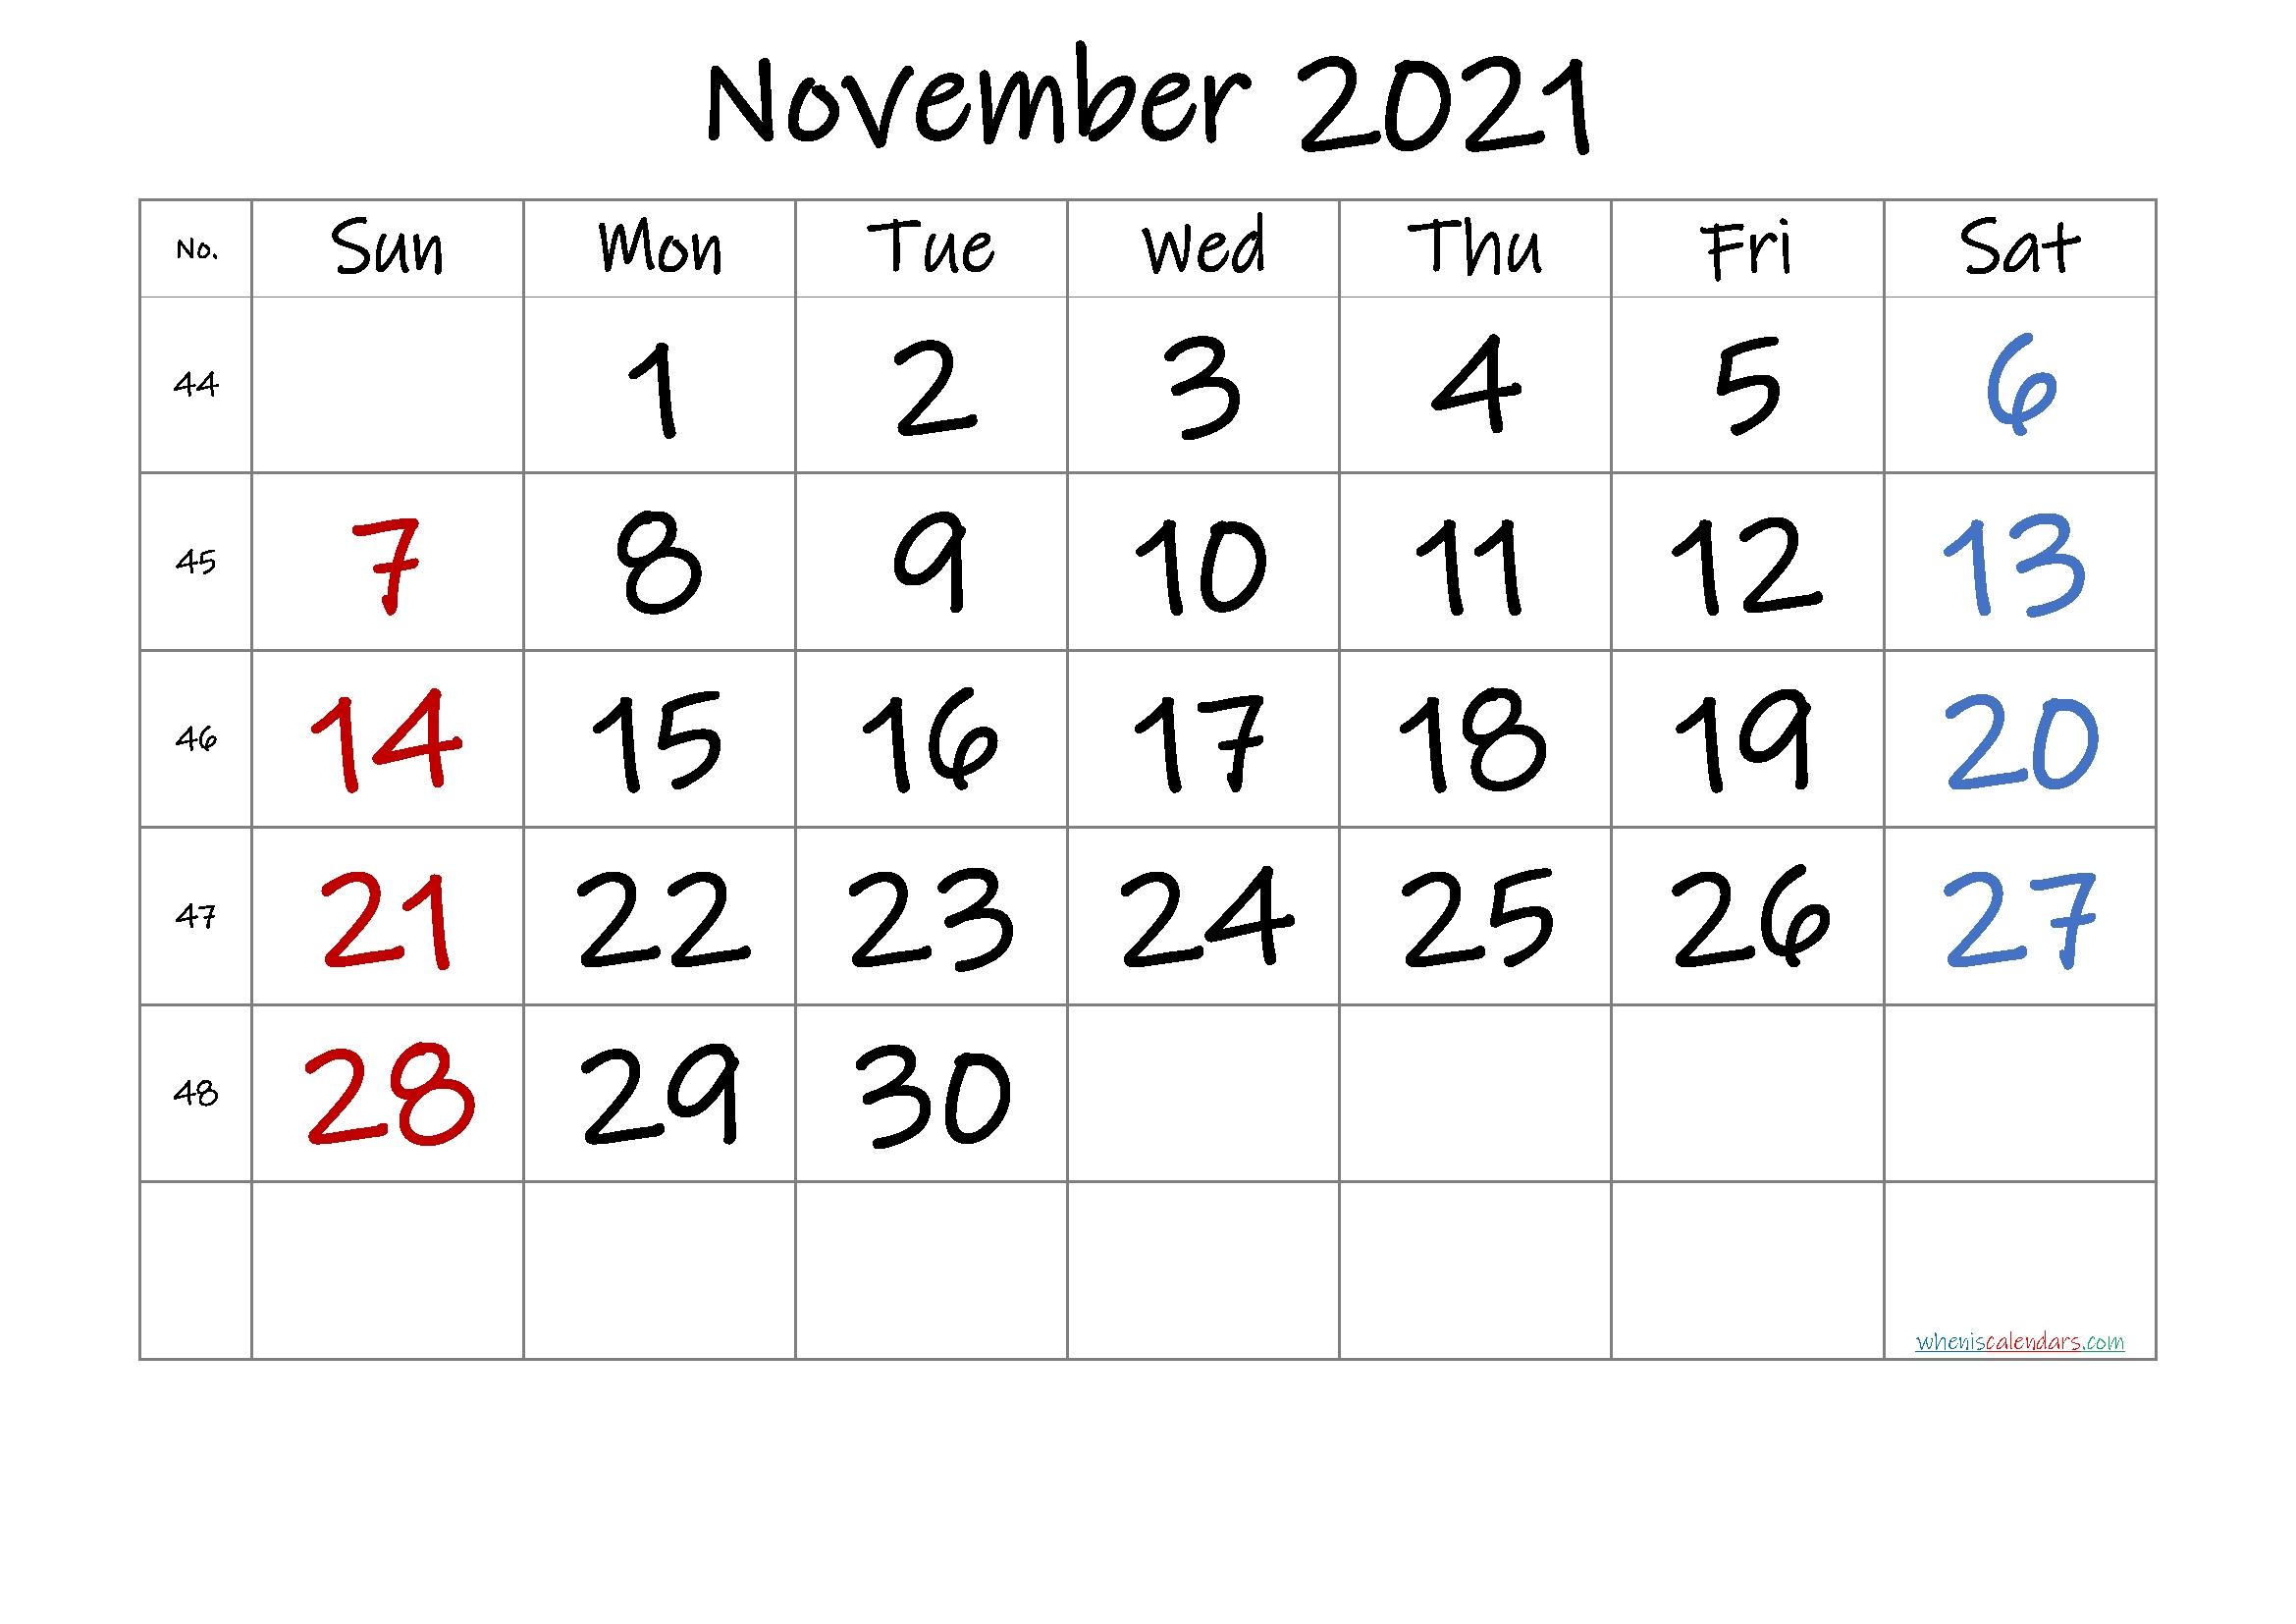 Catch November 2021 Calender Grid